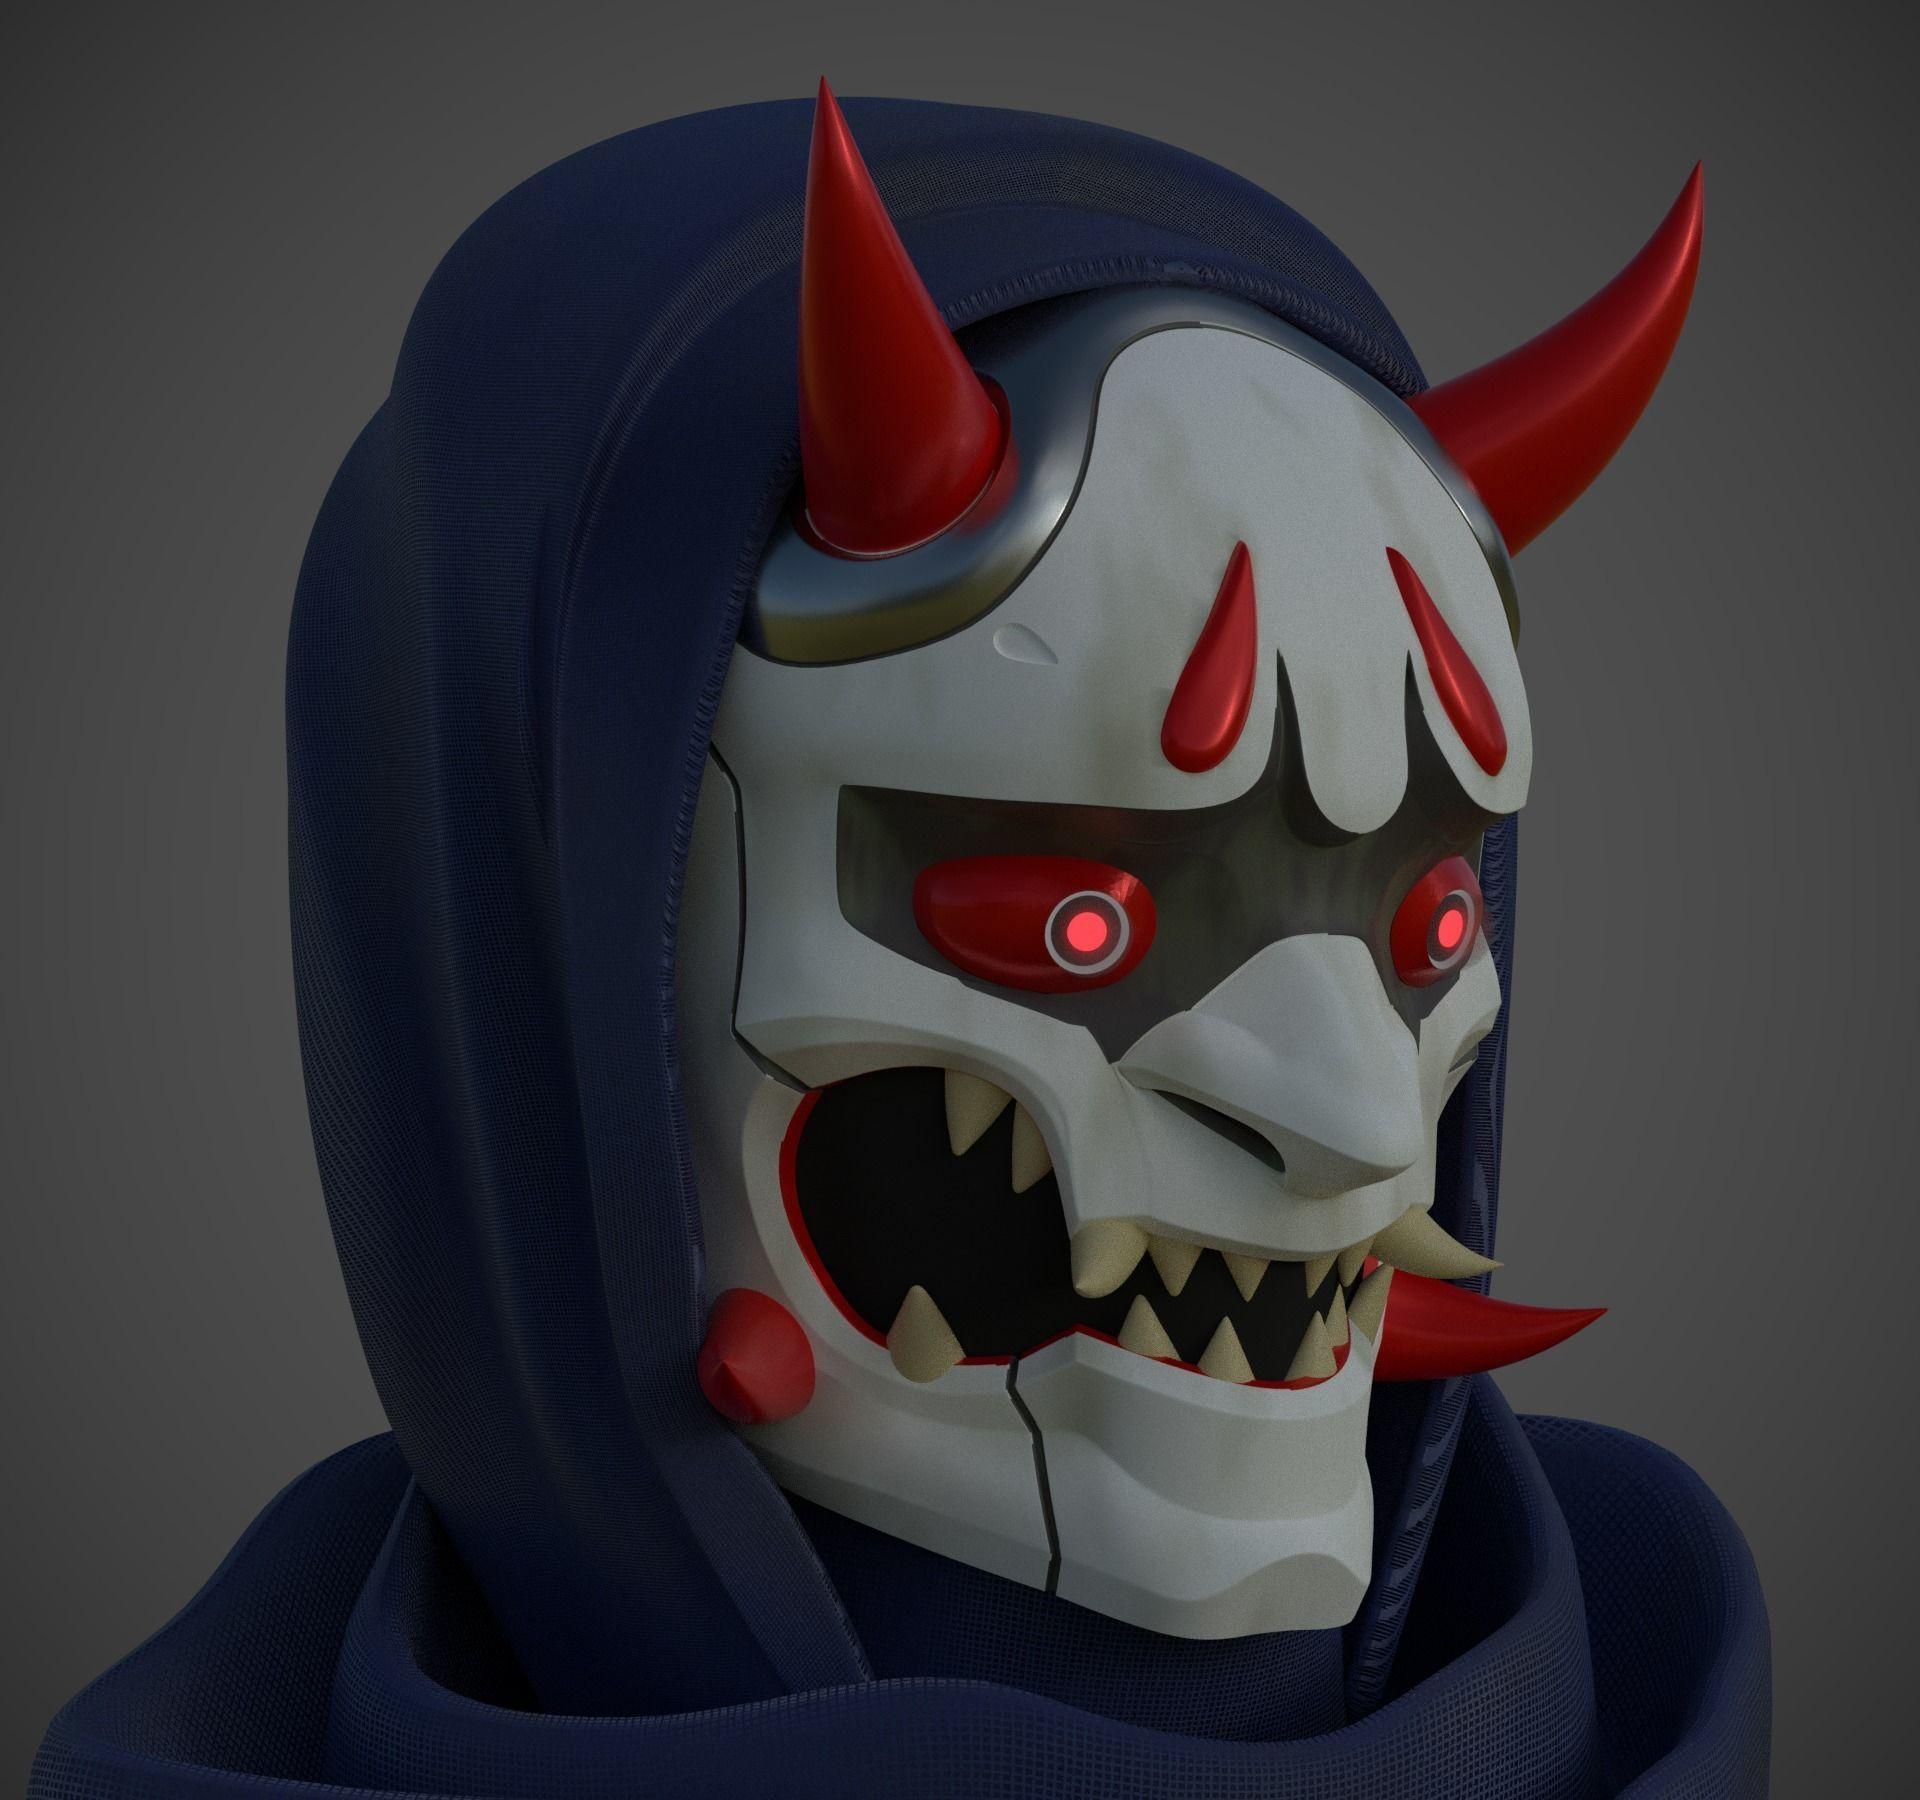 Mask Genji Oni skin from Overwatch